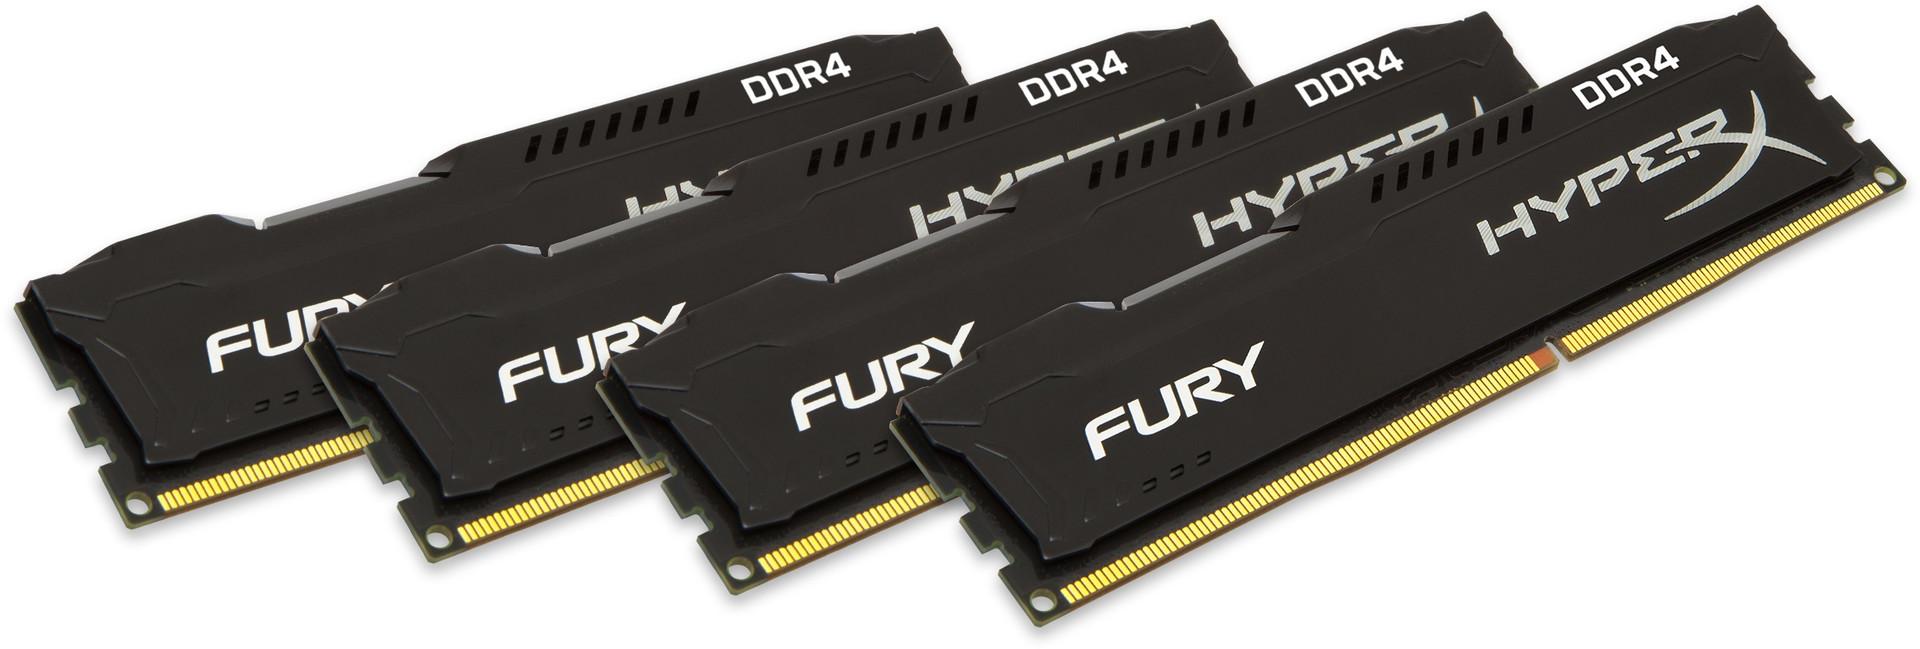 Kingston HyperX FURY Memory Black 32GB DDR4 2400MHz Kit 4×8